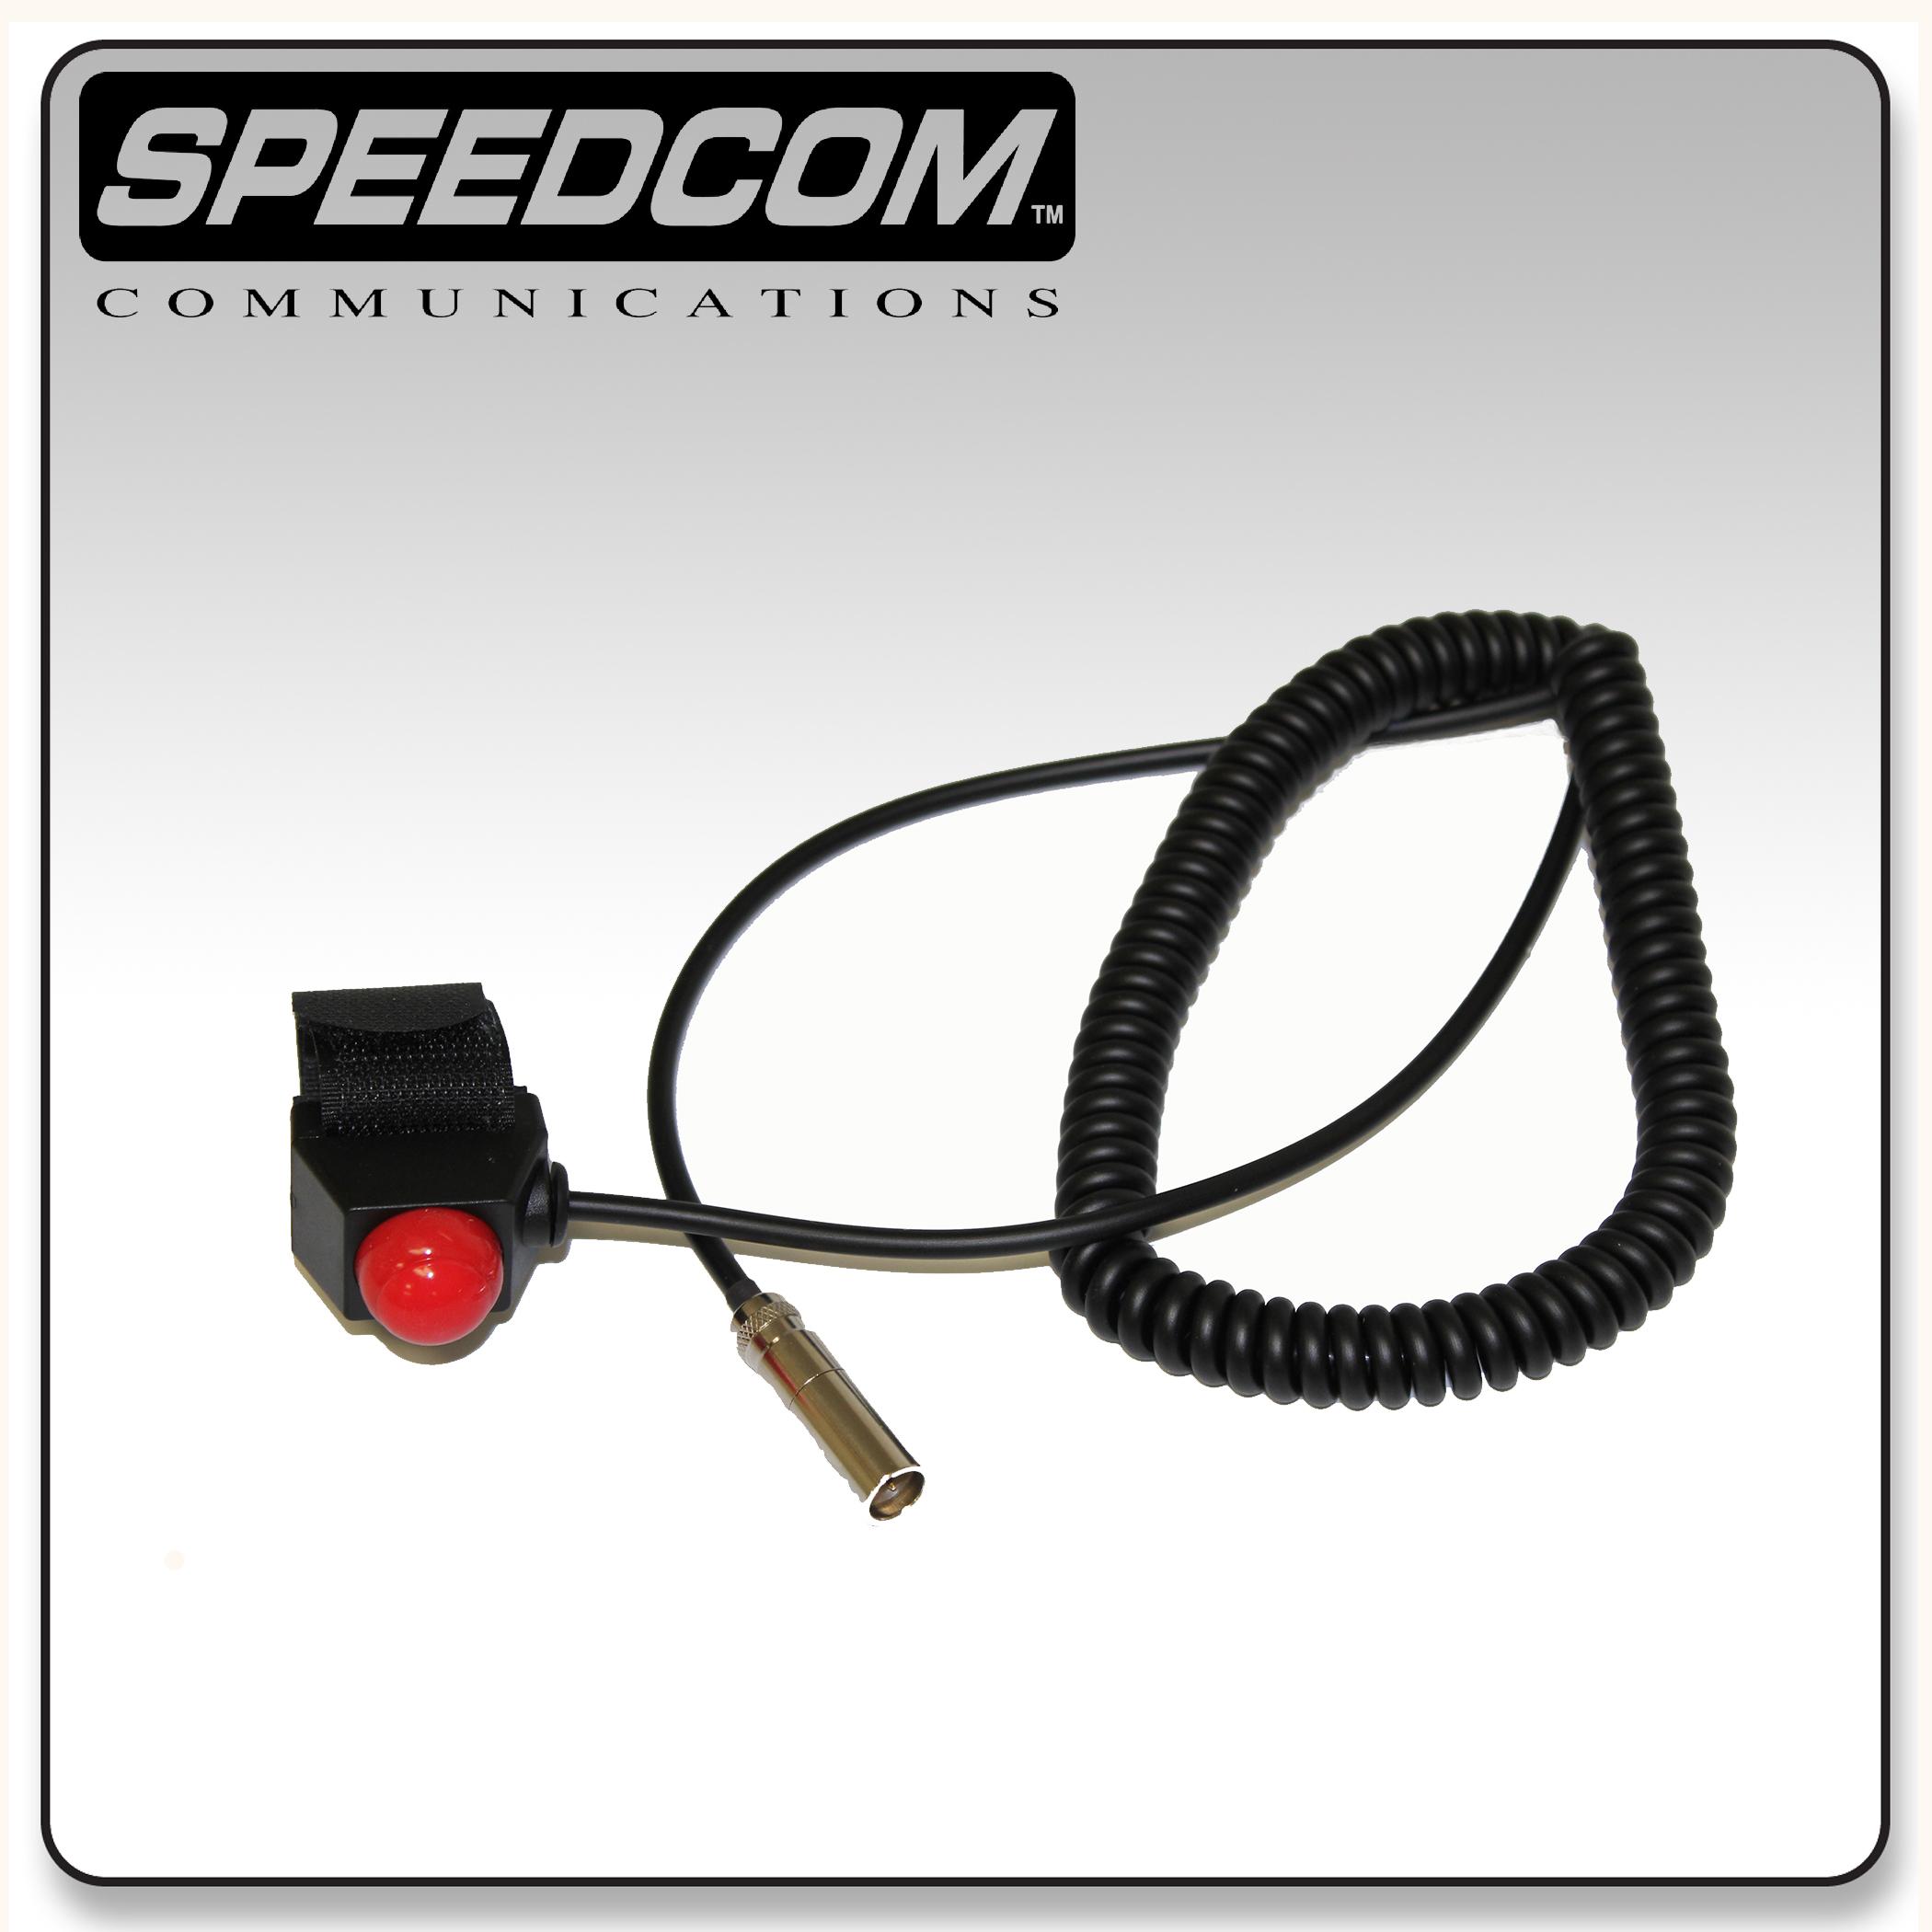 IMSA Style Race Car Harness Racing Radios MOTOROLA Radio Adapter